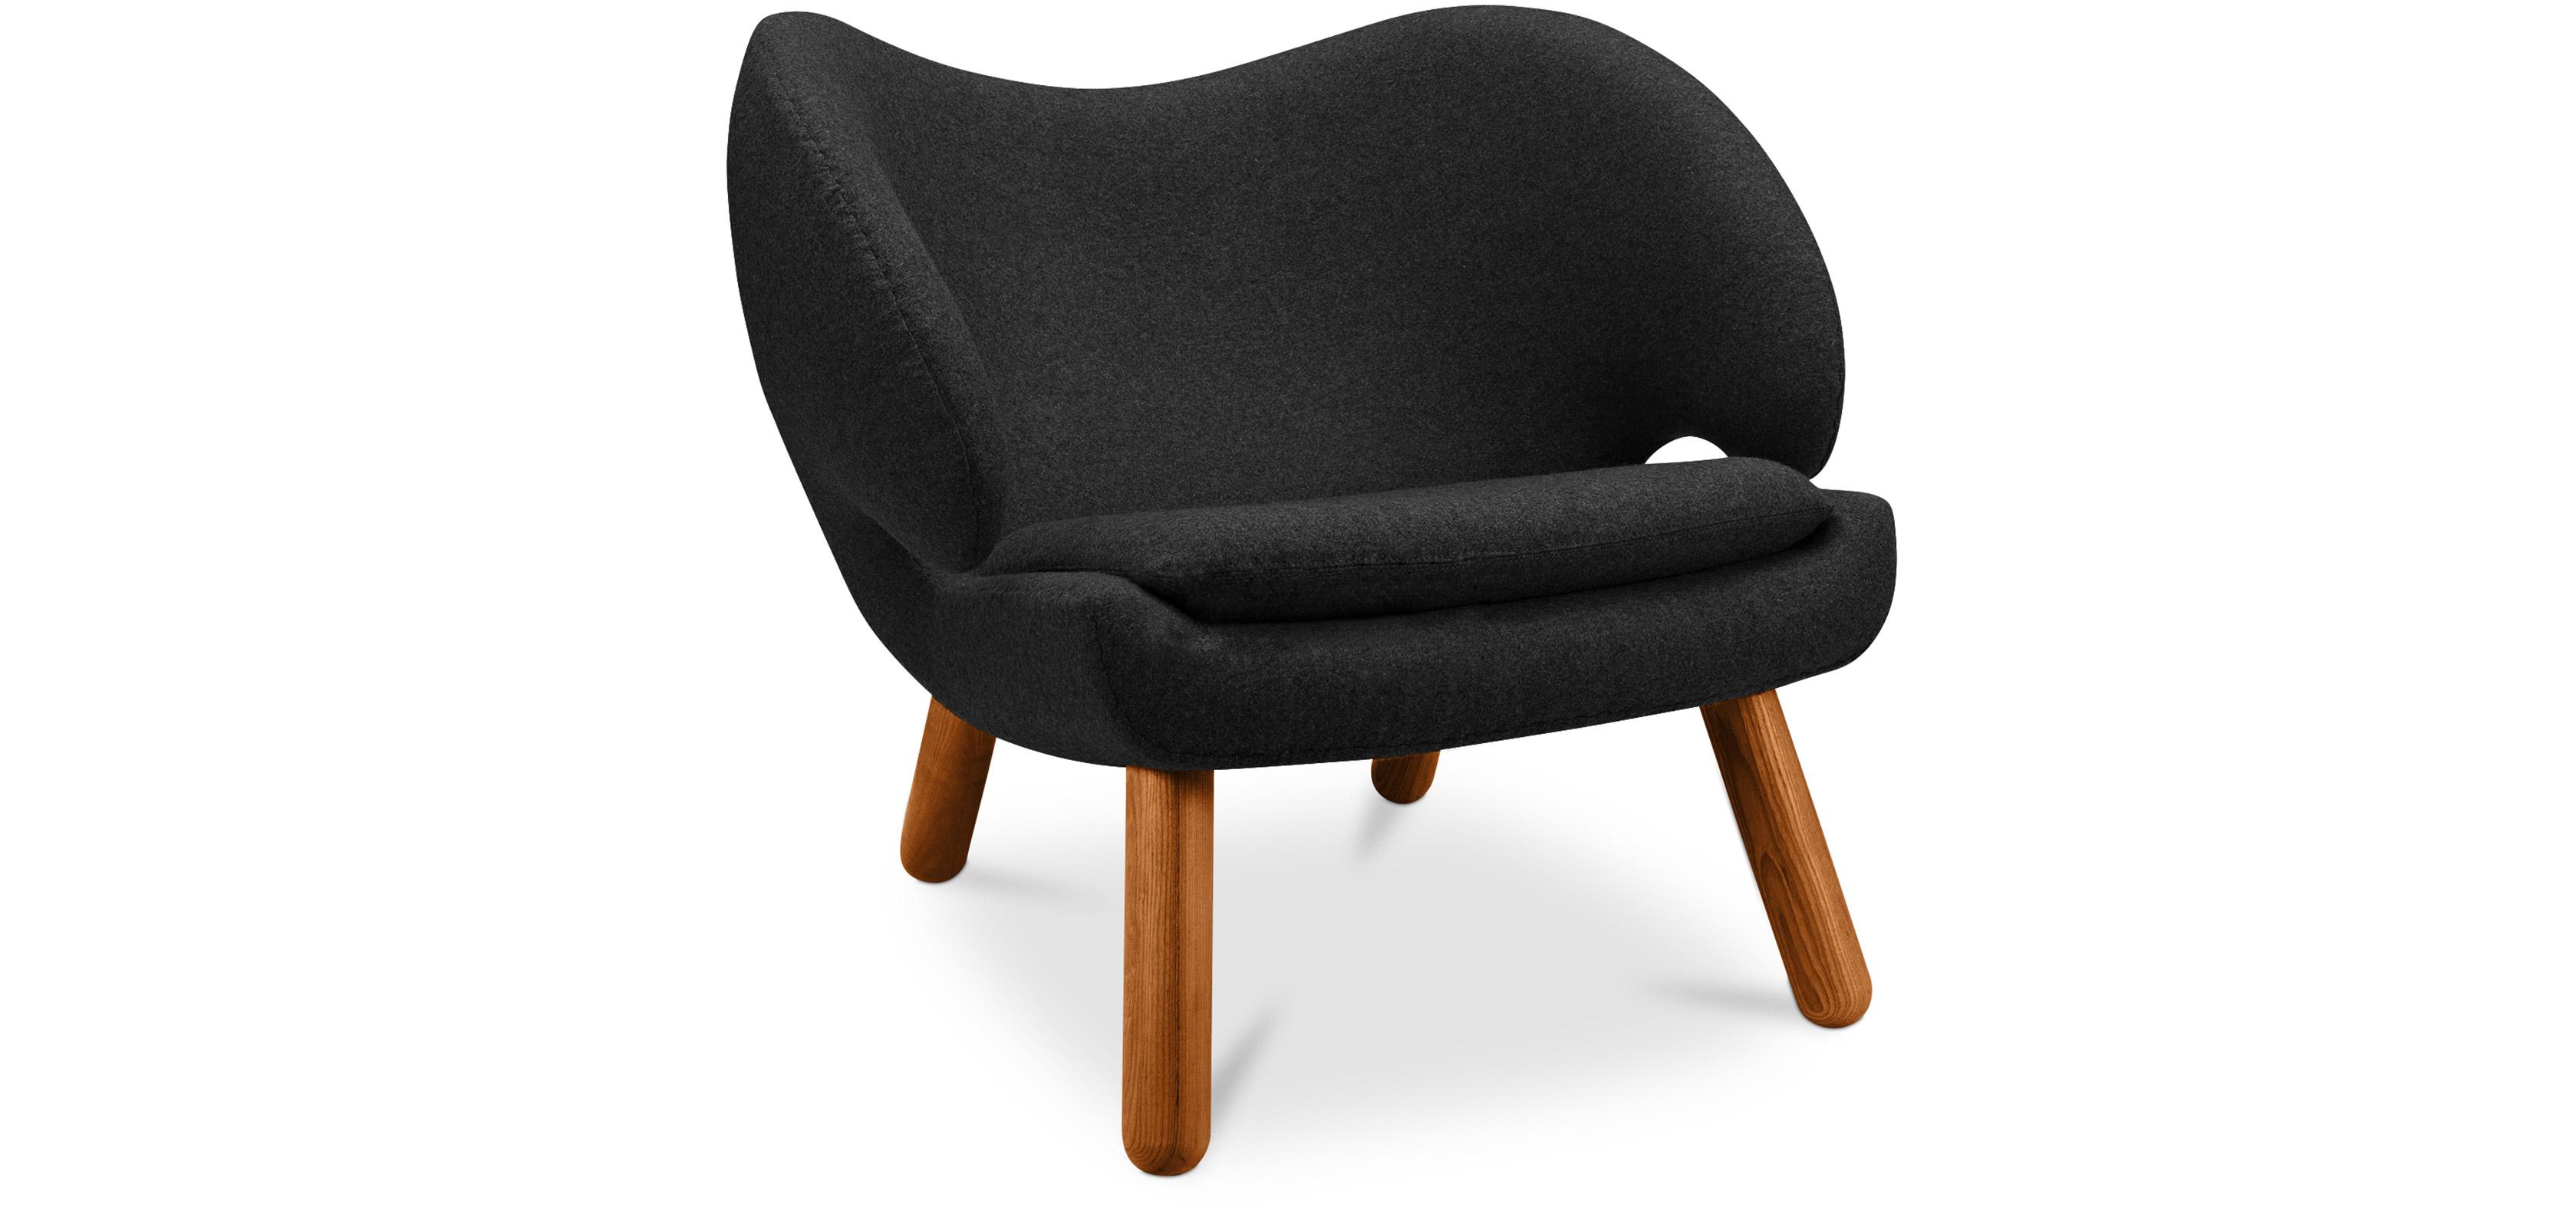 Skandinavisches Design Sessel Sessel Skandinavisches Design Sessel